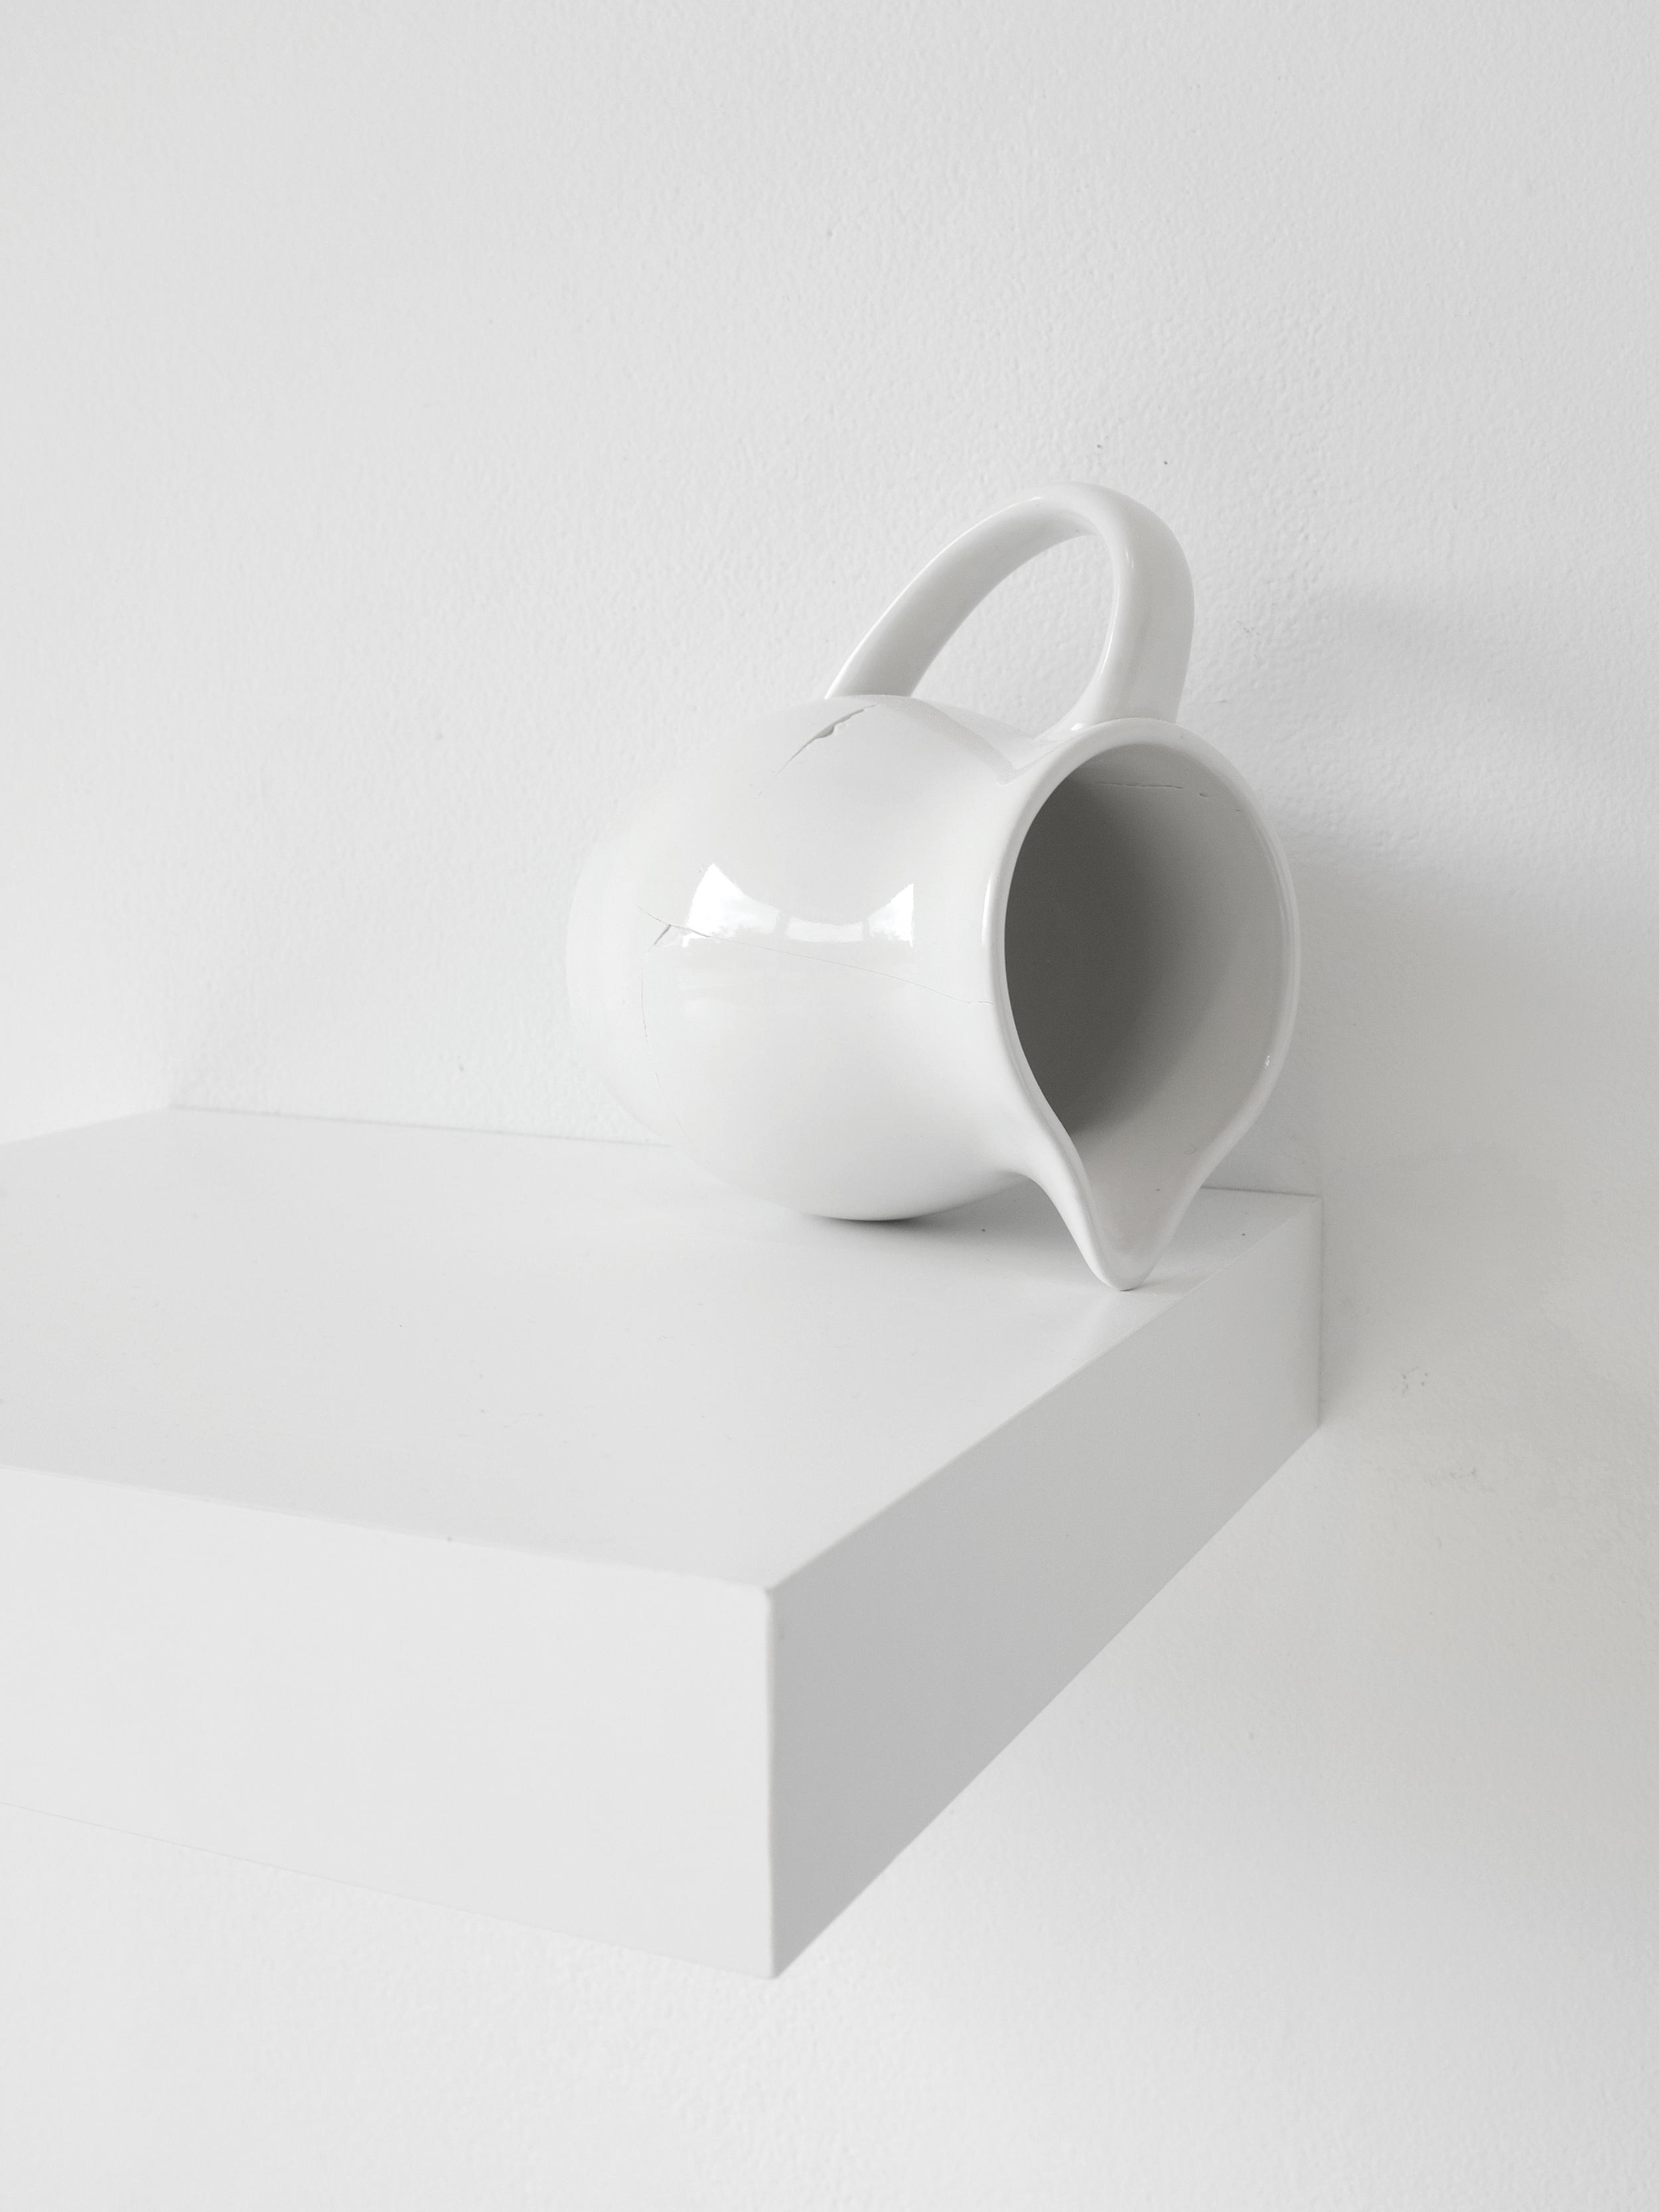 "Installation of milk pitcher (found), broken and fixed, 5""x4"", 2015 (detail)"